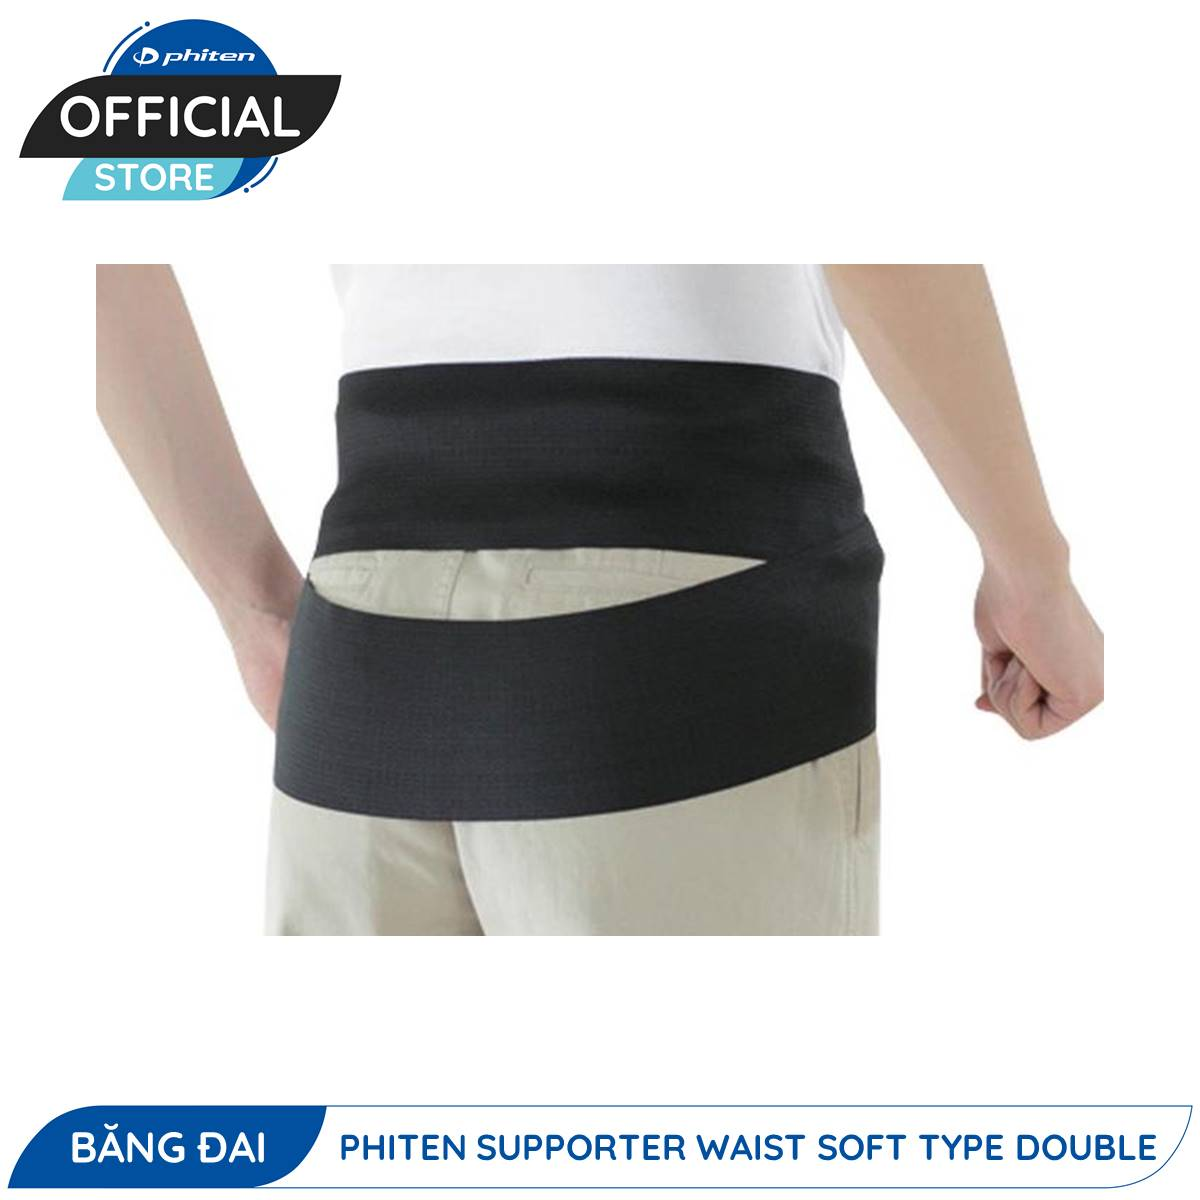 Đai Bảo Vệ Thắt Lưng Phiten Supporter Waist Soft Type Double (Loại Kép Mềm)